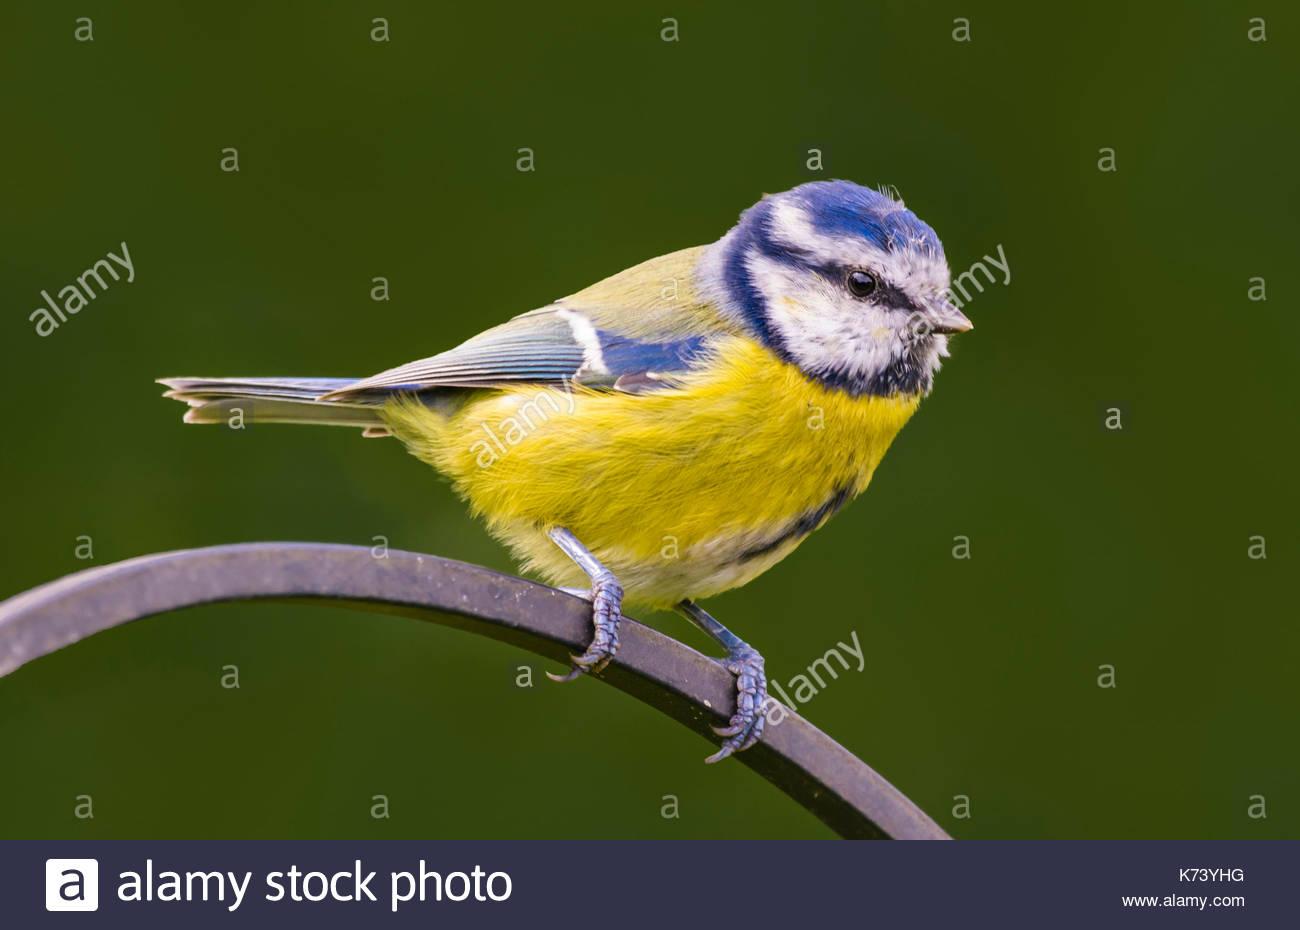 cyanistes-caeruleus-eurasian-blue-tit-ad